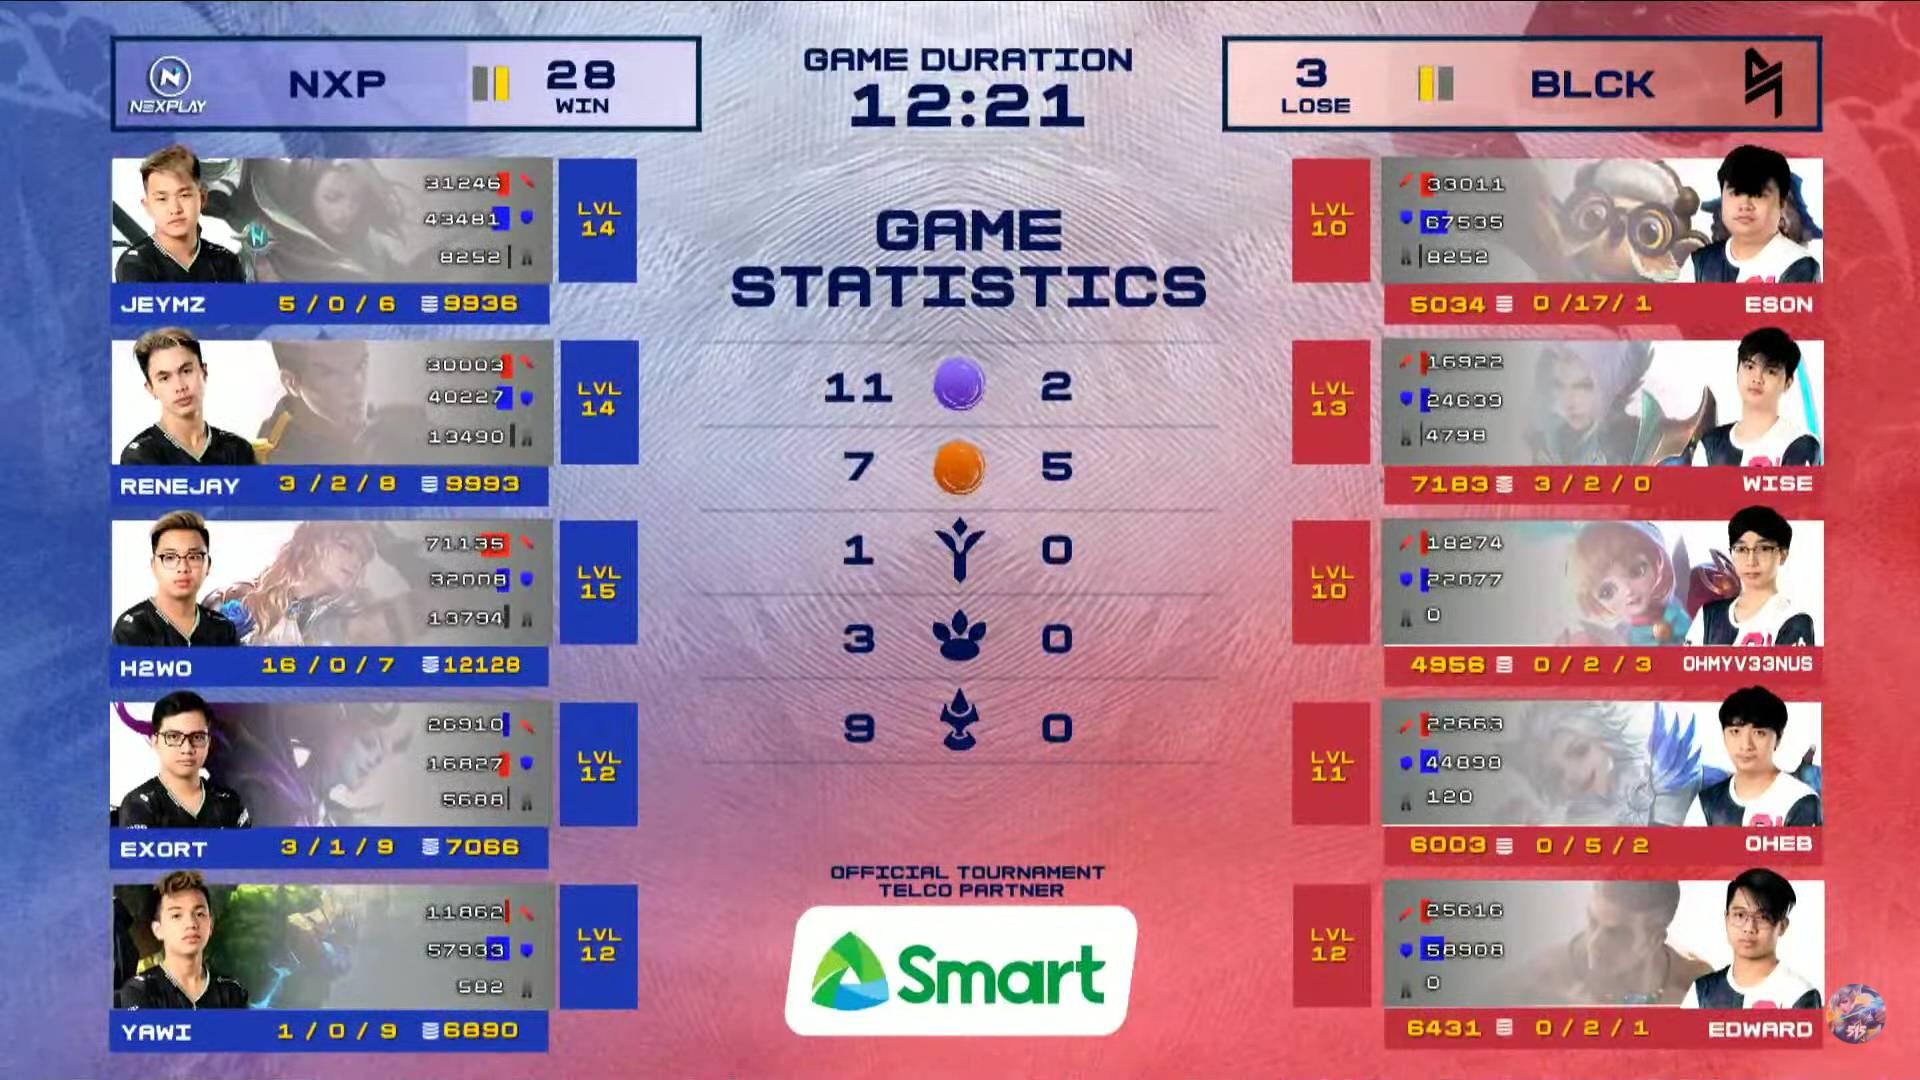 MPL-PH-Season-7-Blacklist-def-Nexplay-Game-Two Blacklist survives Renejay-H2wo hijack, ends MPL PH elims at top spot ESports Mobile Legends MPL-PH News  - philippine sports news